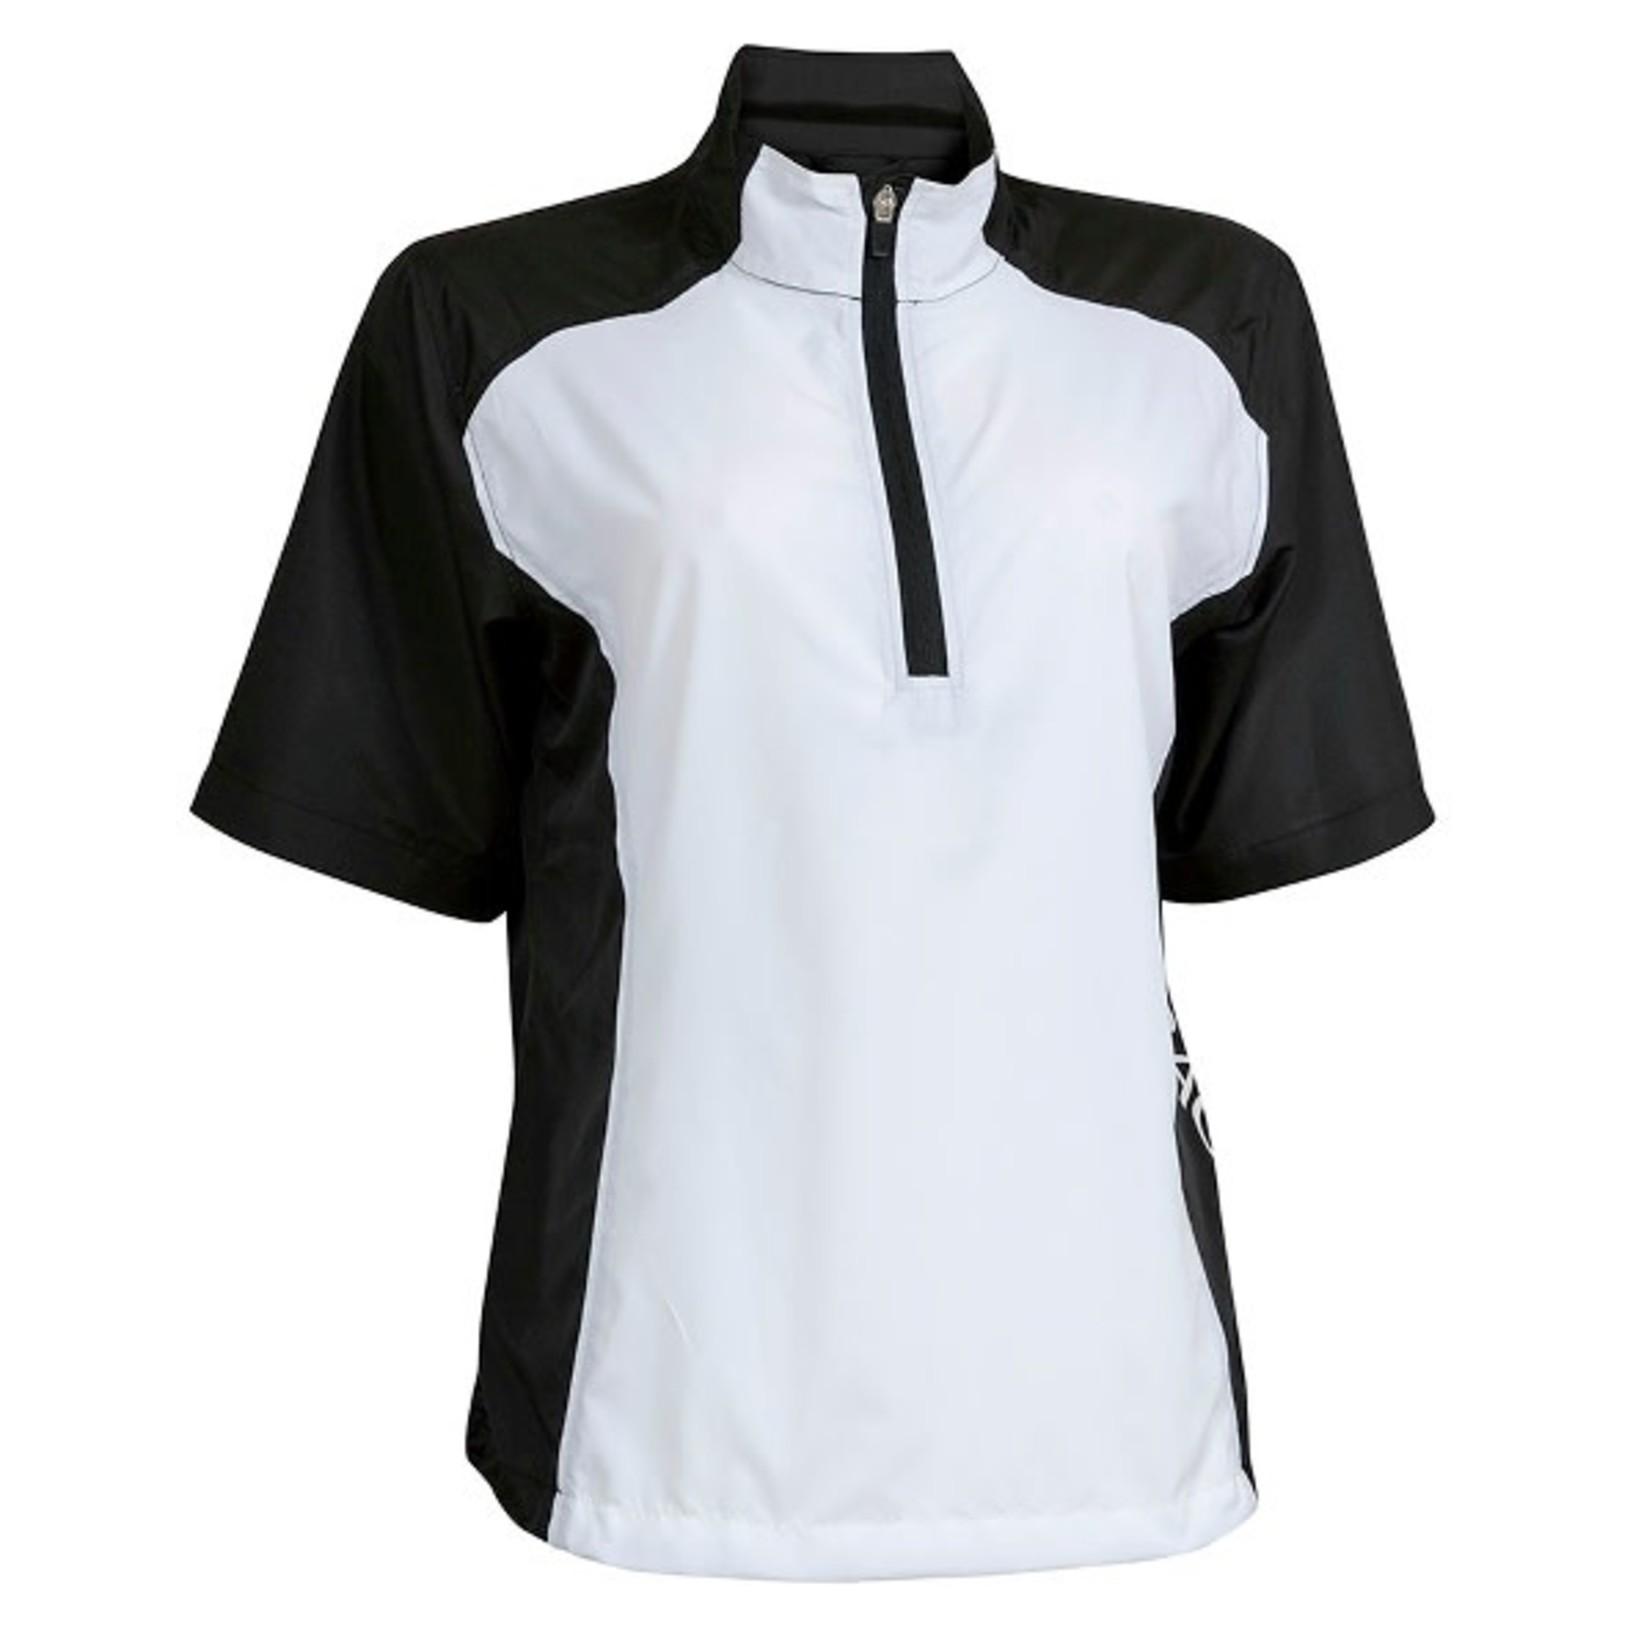 Backtee BackTee Ladies Short Sleeve Windshirt BLACK/WHITE